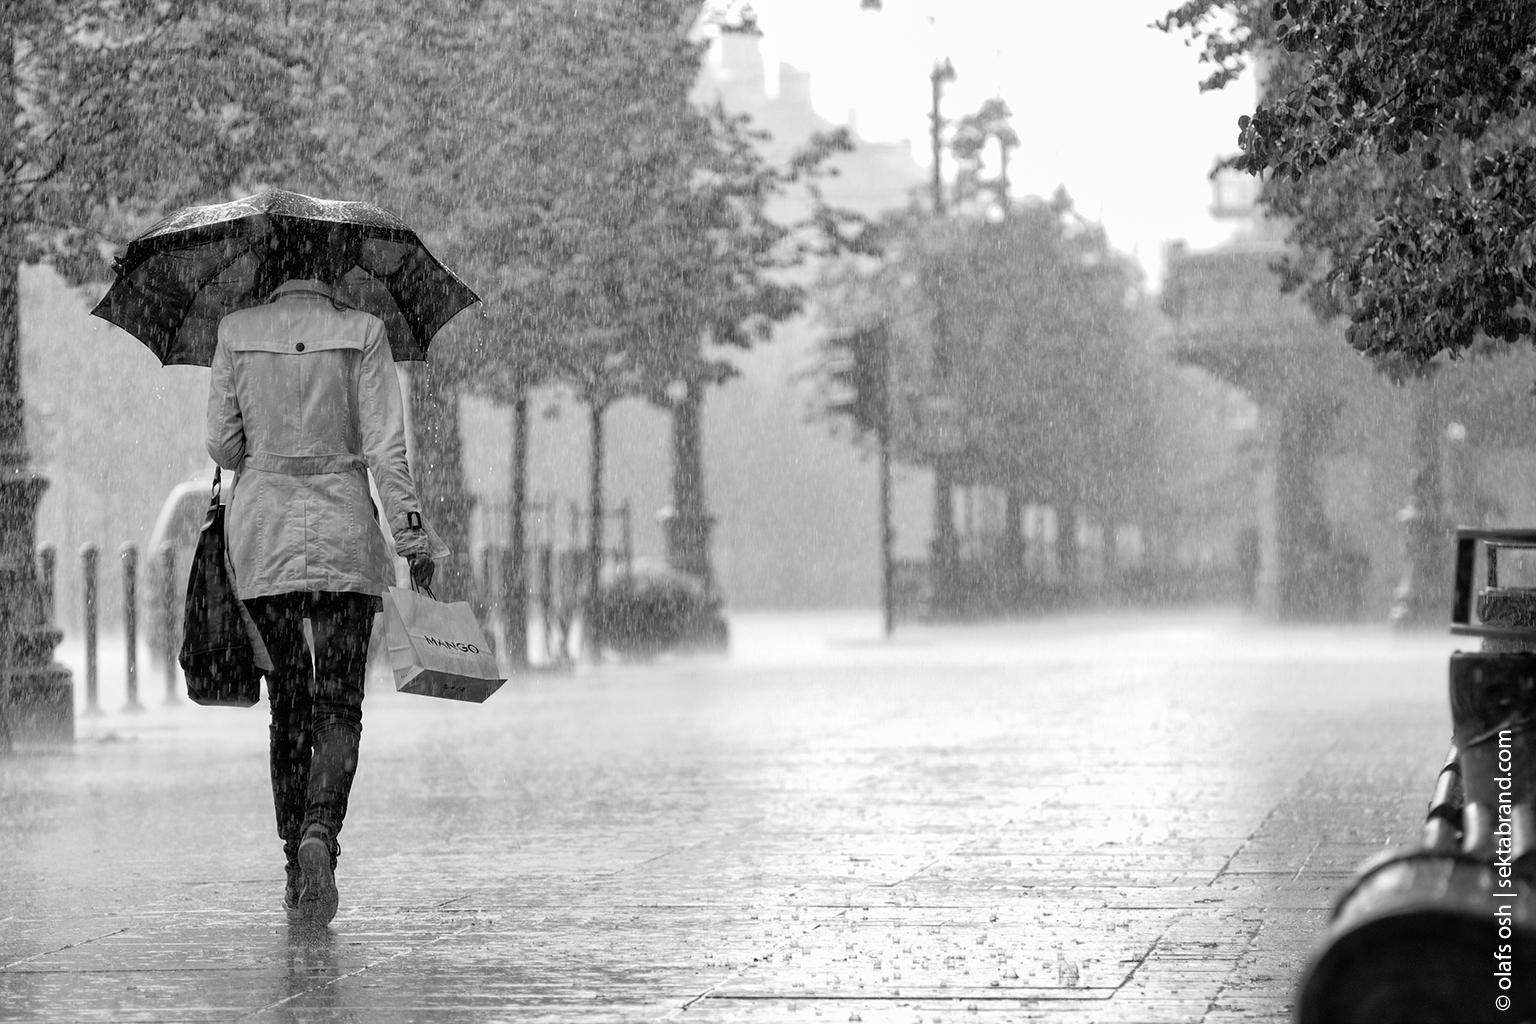 cold rainy day quotes quotesgram